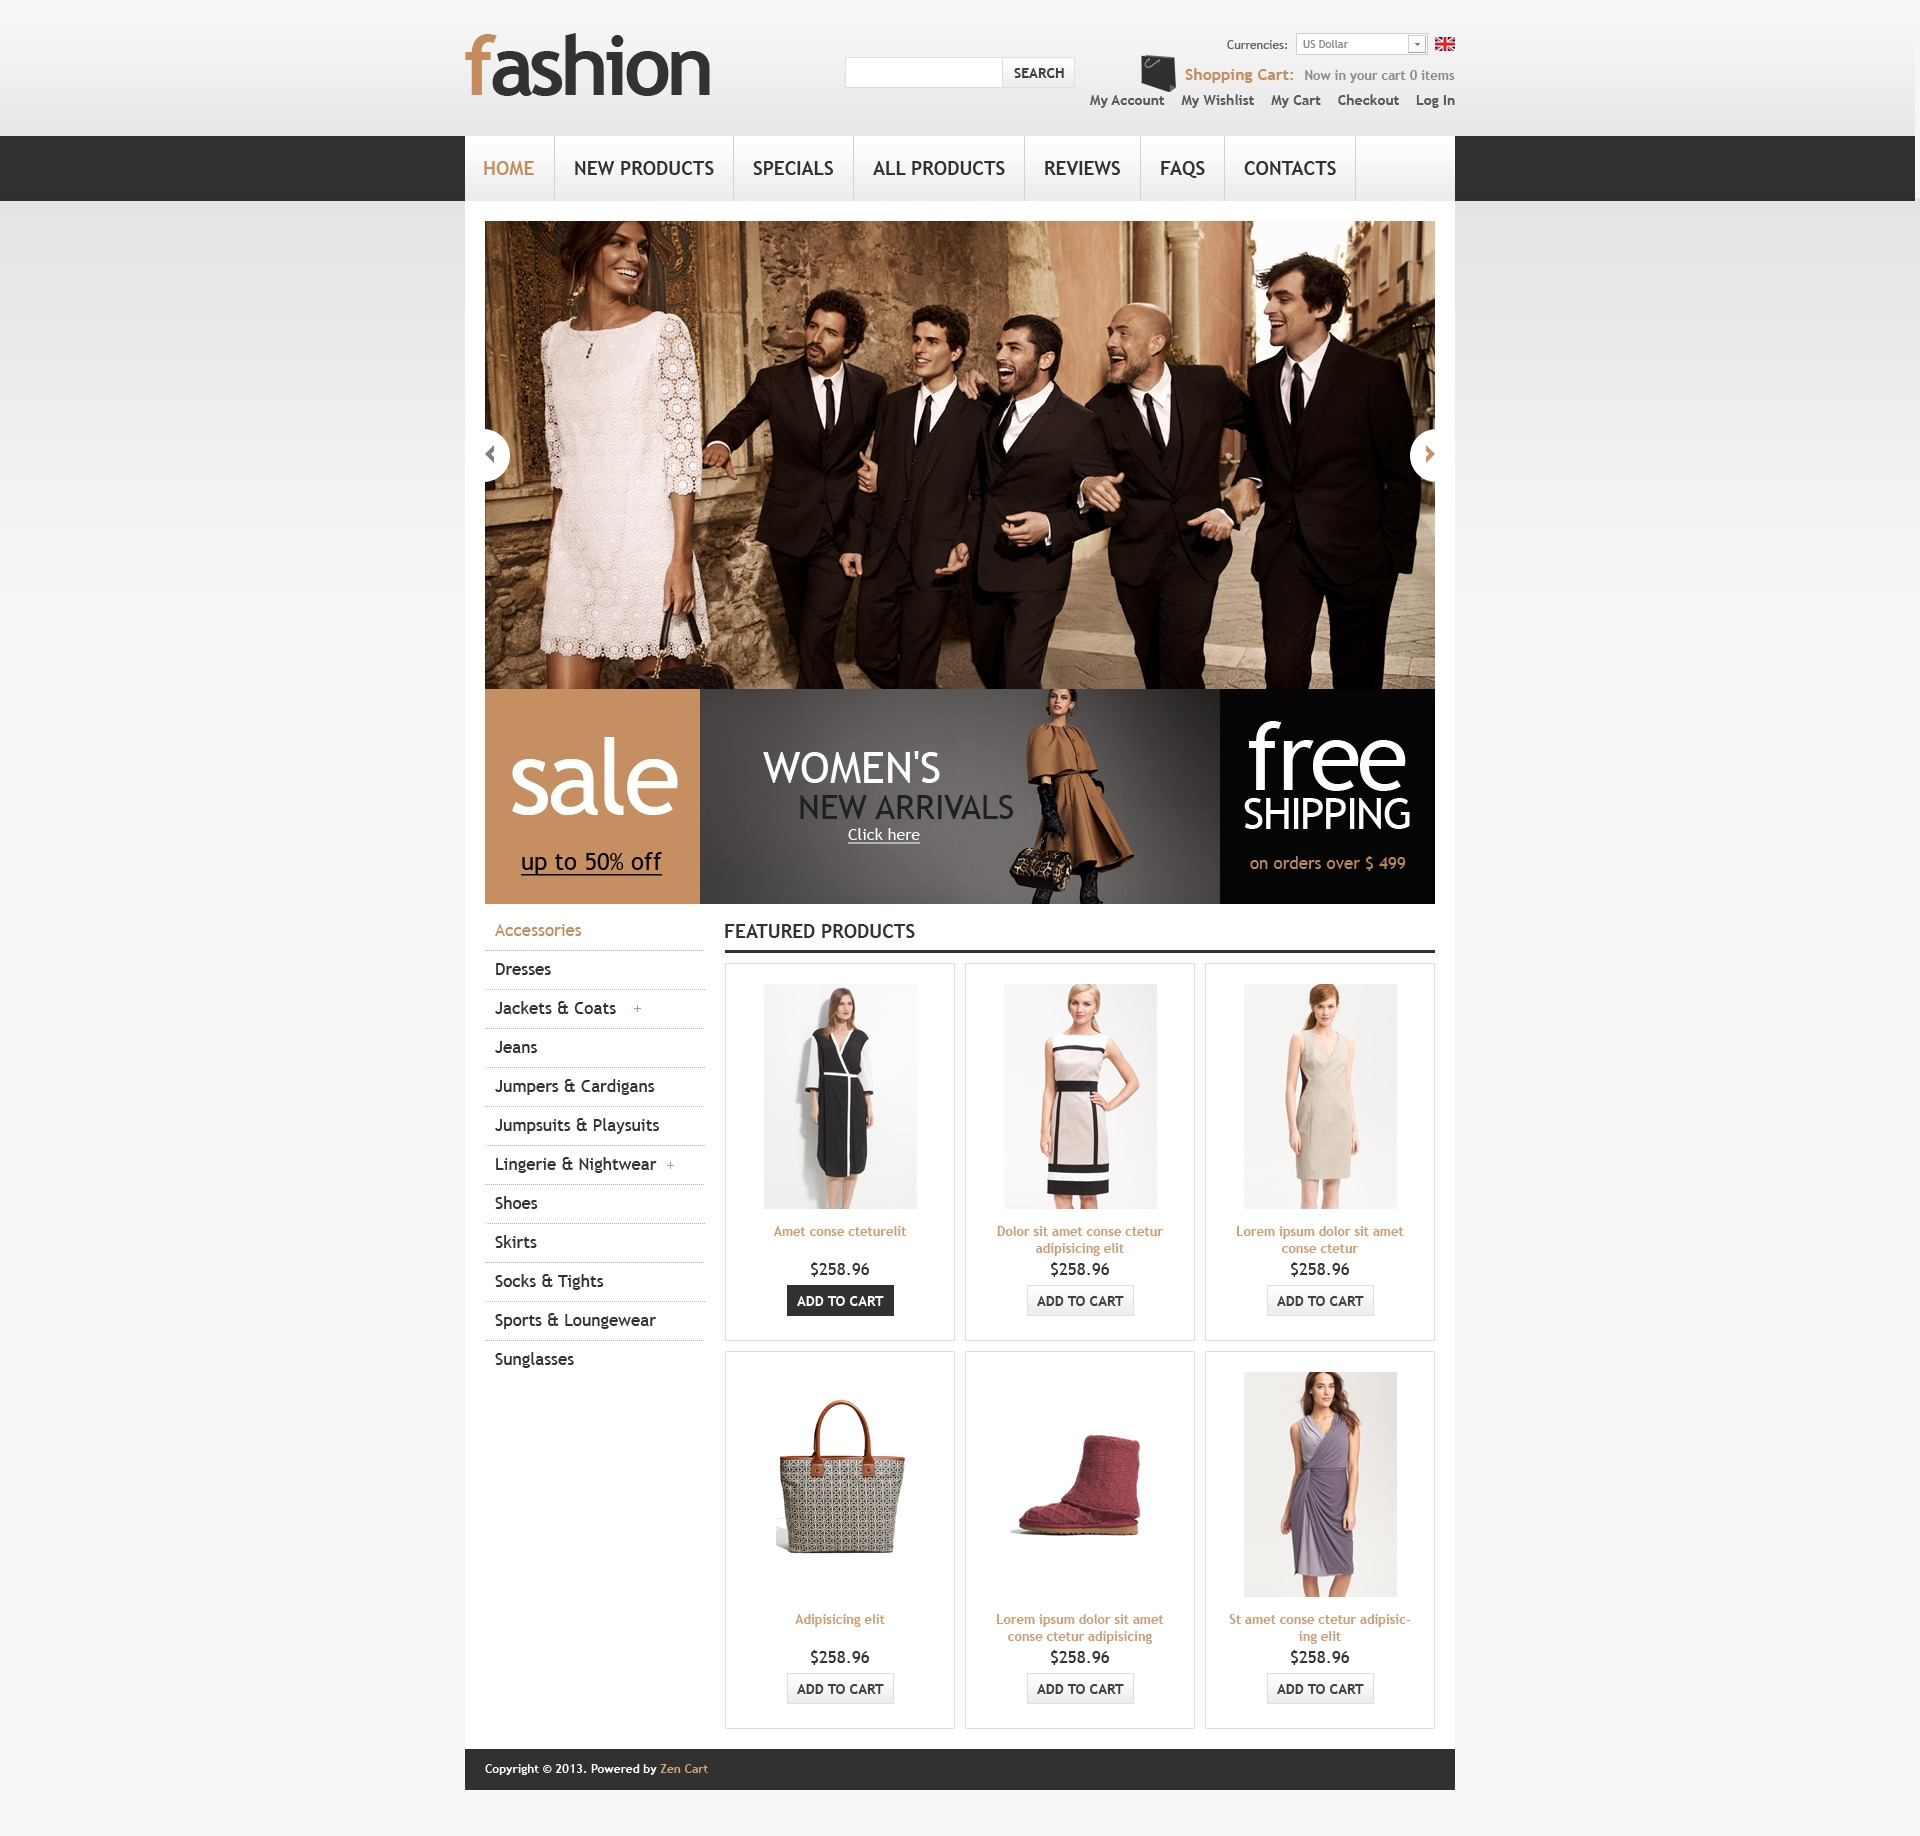 Szablon ZenCart Classy Fashion Store #43889 - zrzut ekranu